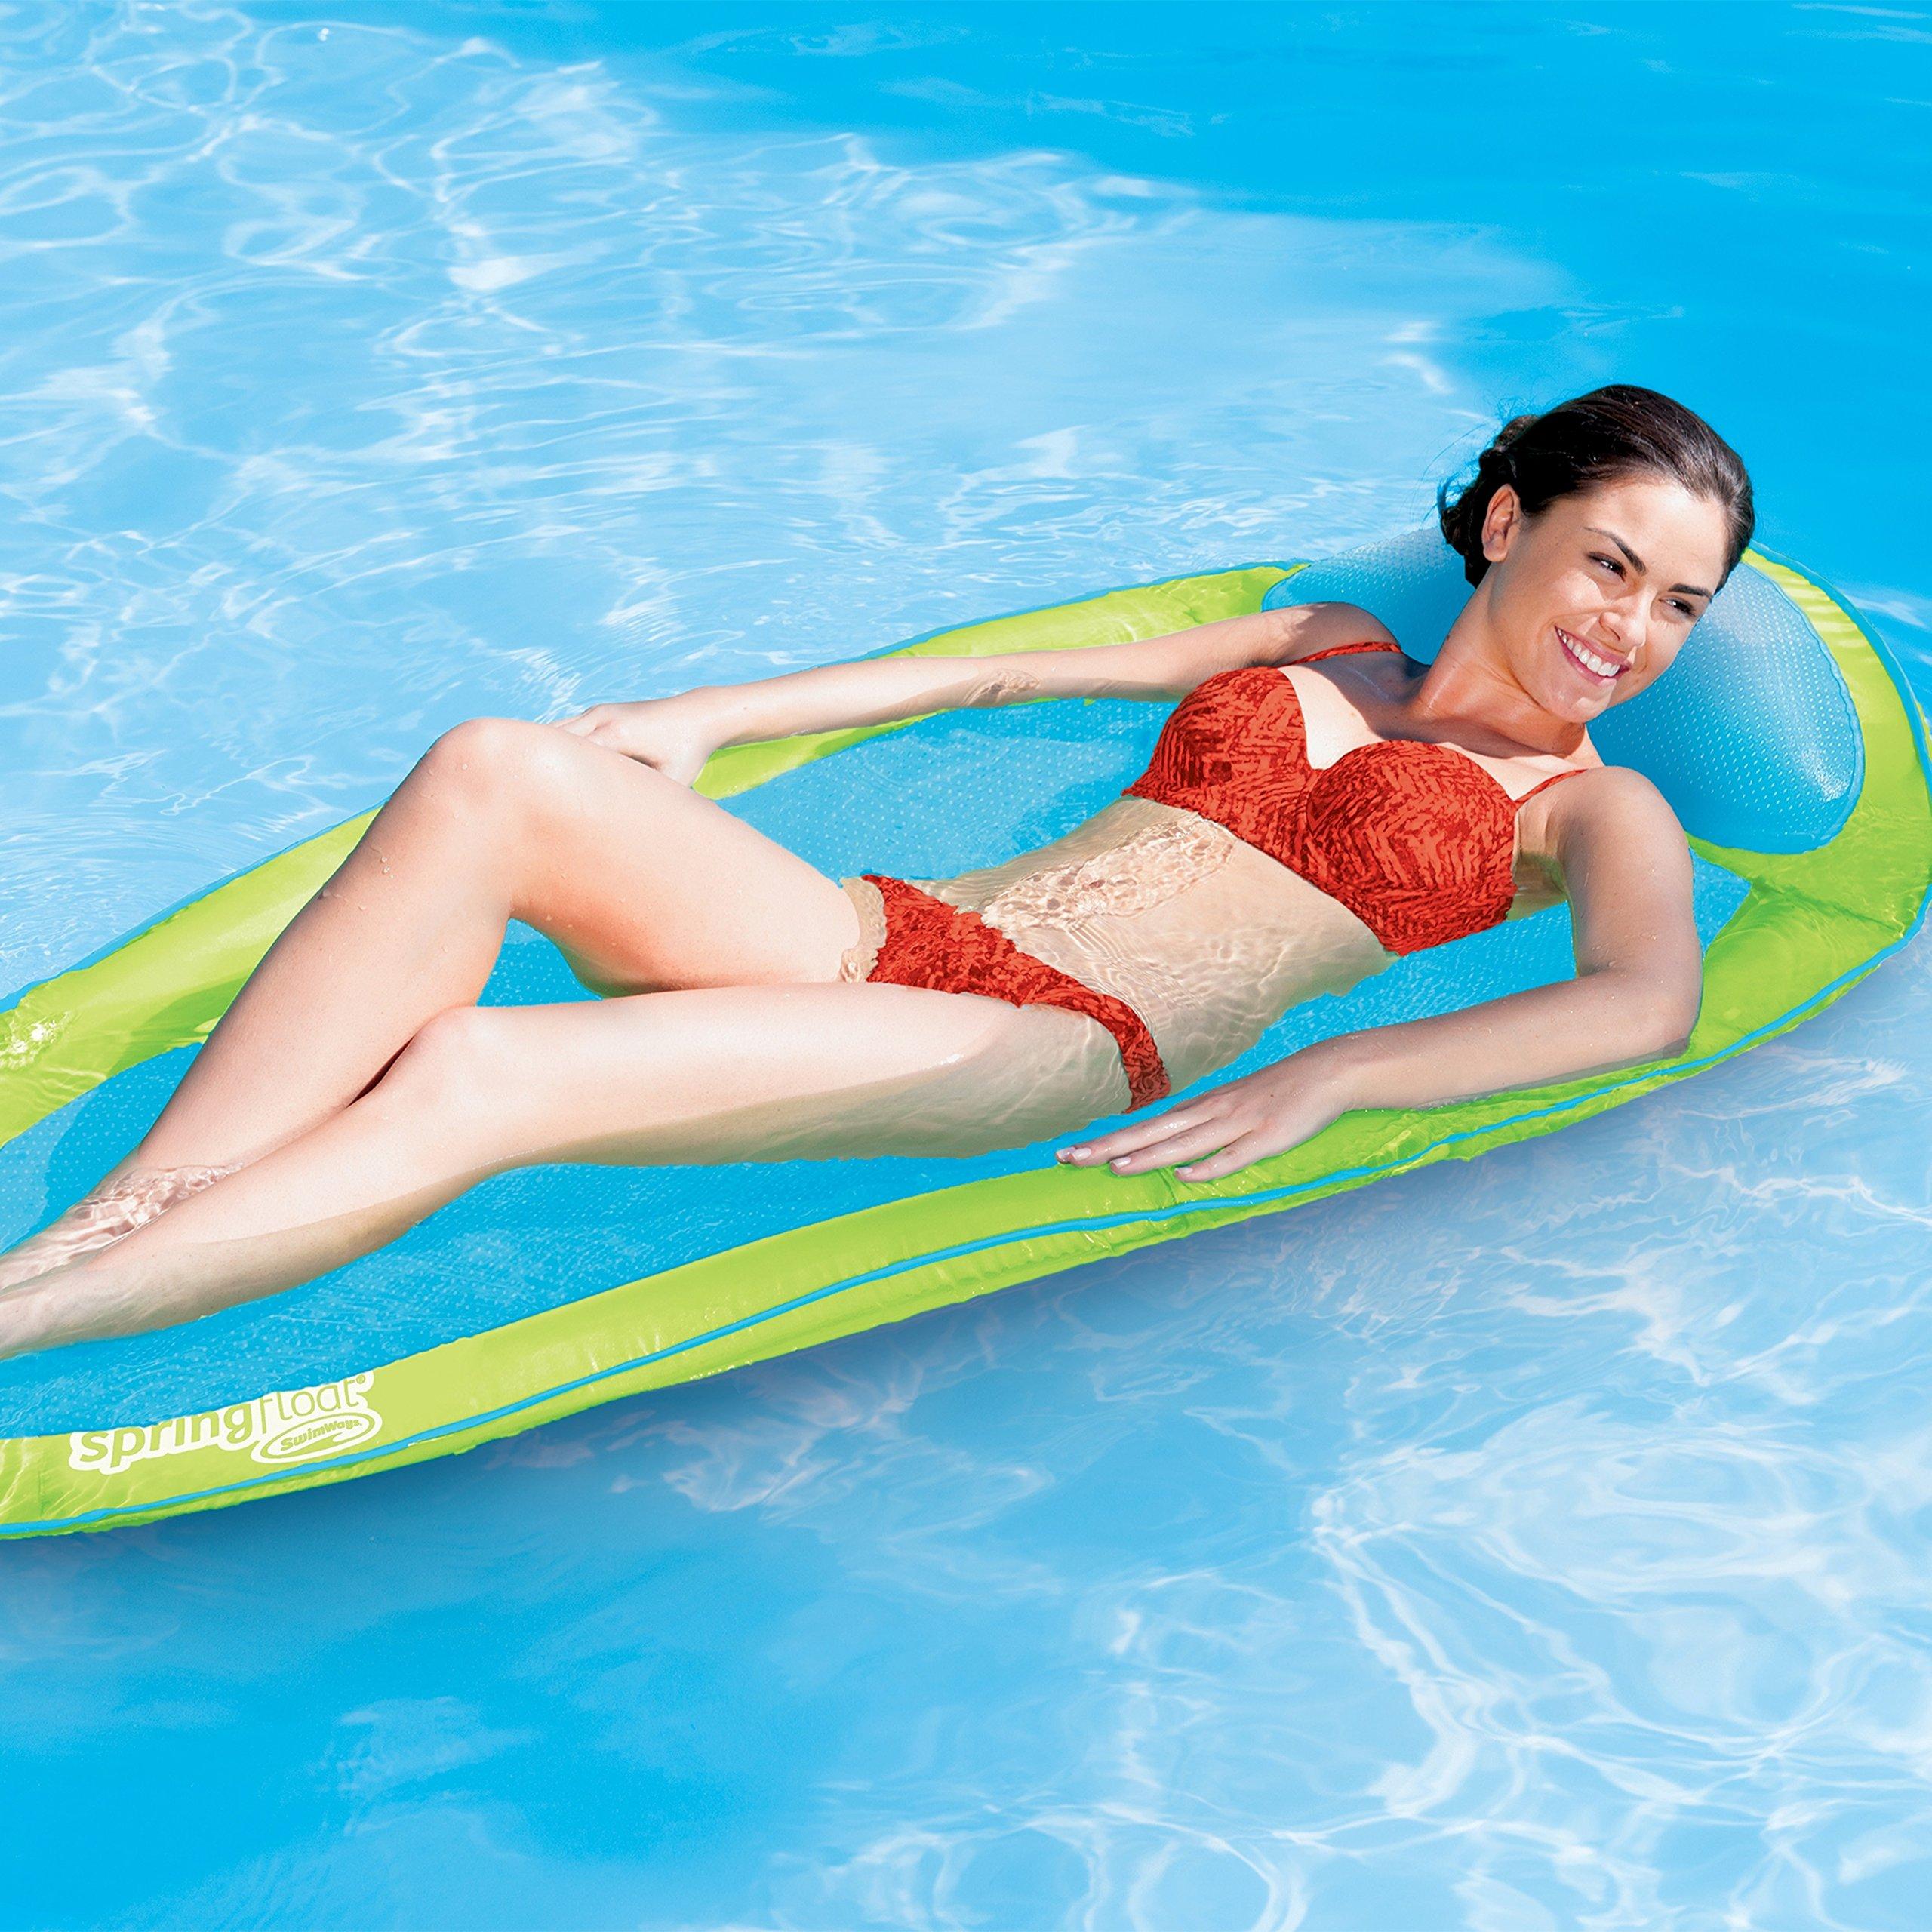 SwimWays Original Spring Float - Floating Swim Hammock for Pool or Lake - Lime/Light Blue by SwimWays (Image #2)